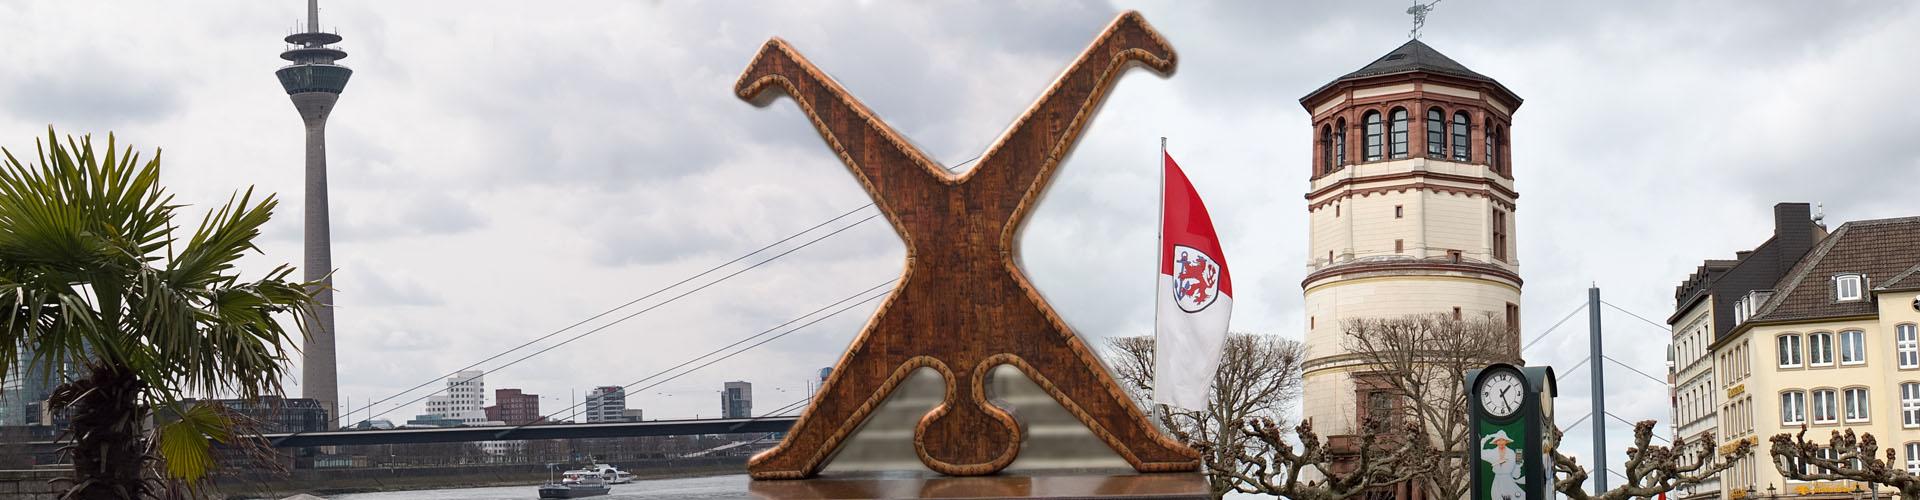 banner-rad-schlossturm